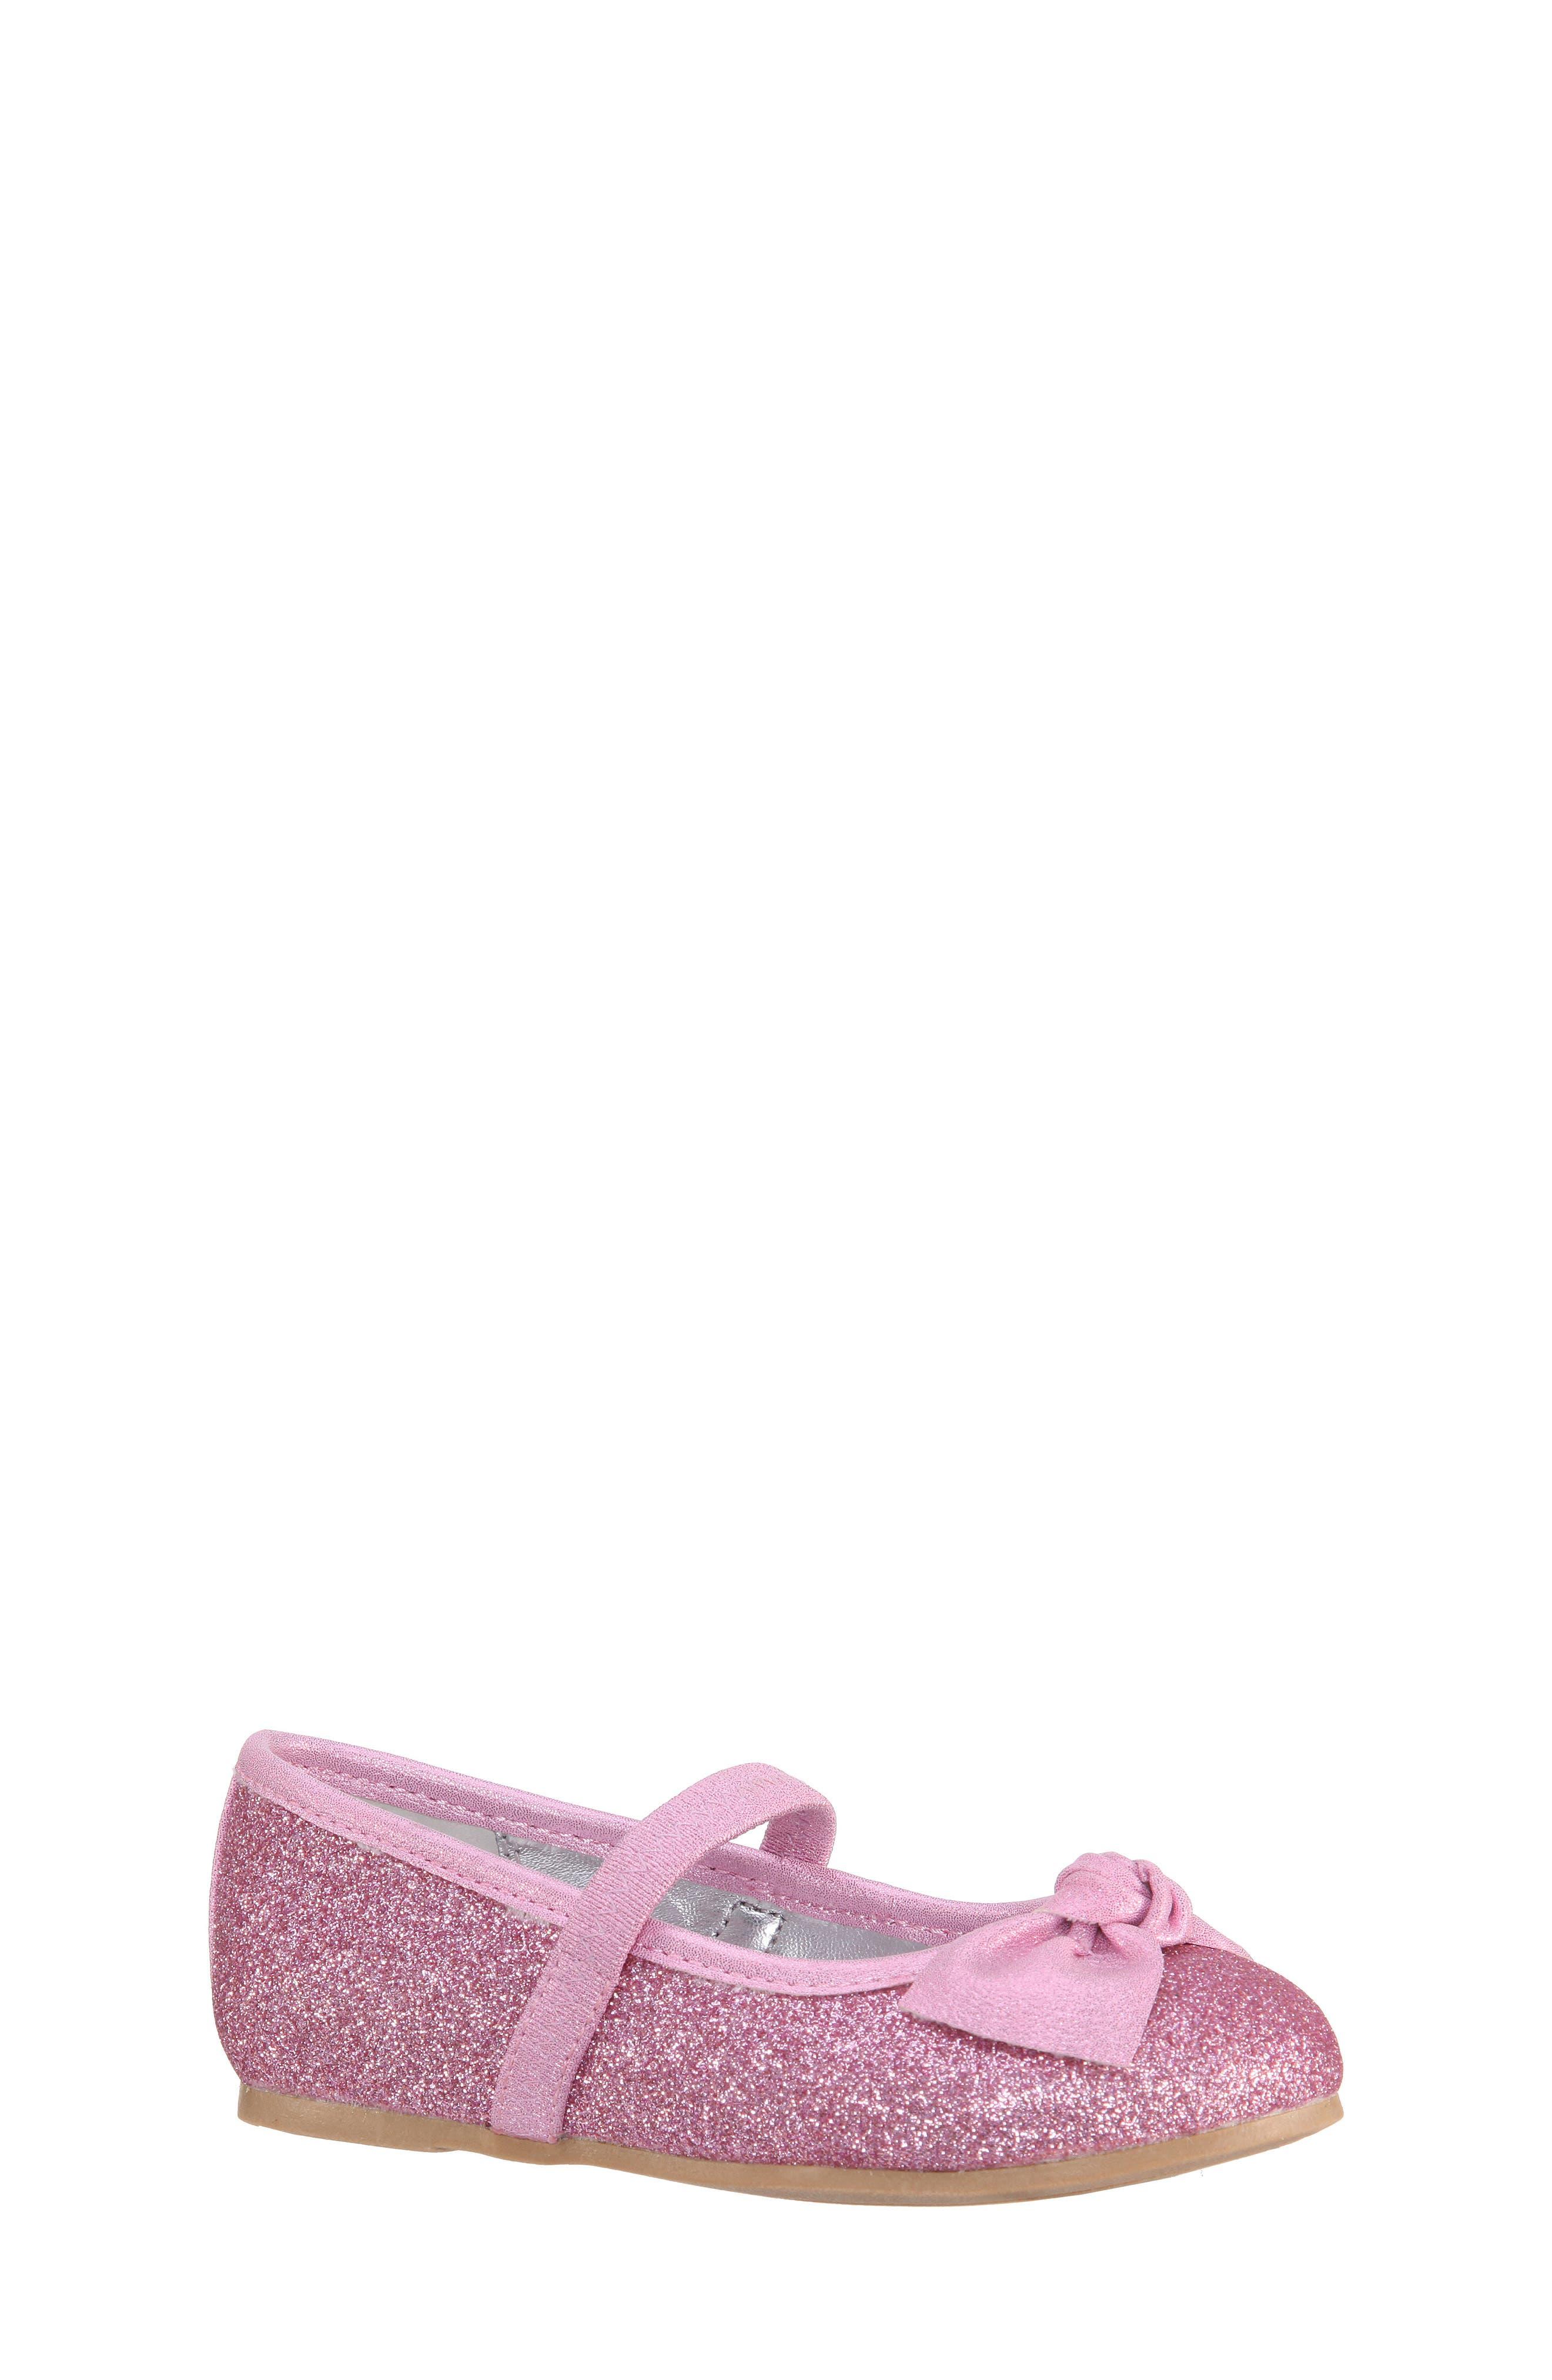 Larabeth-T Glitter Bow Ballet Flat,                         Main,                         color, Light Pink Metallic/ Glitter